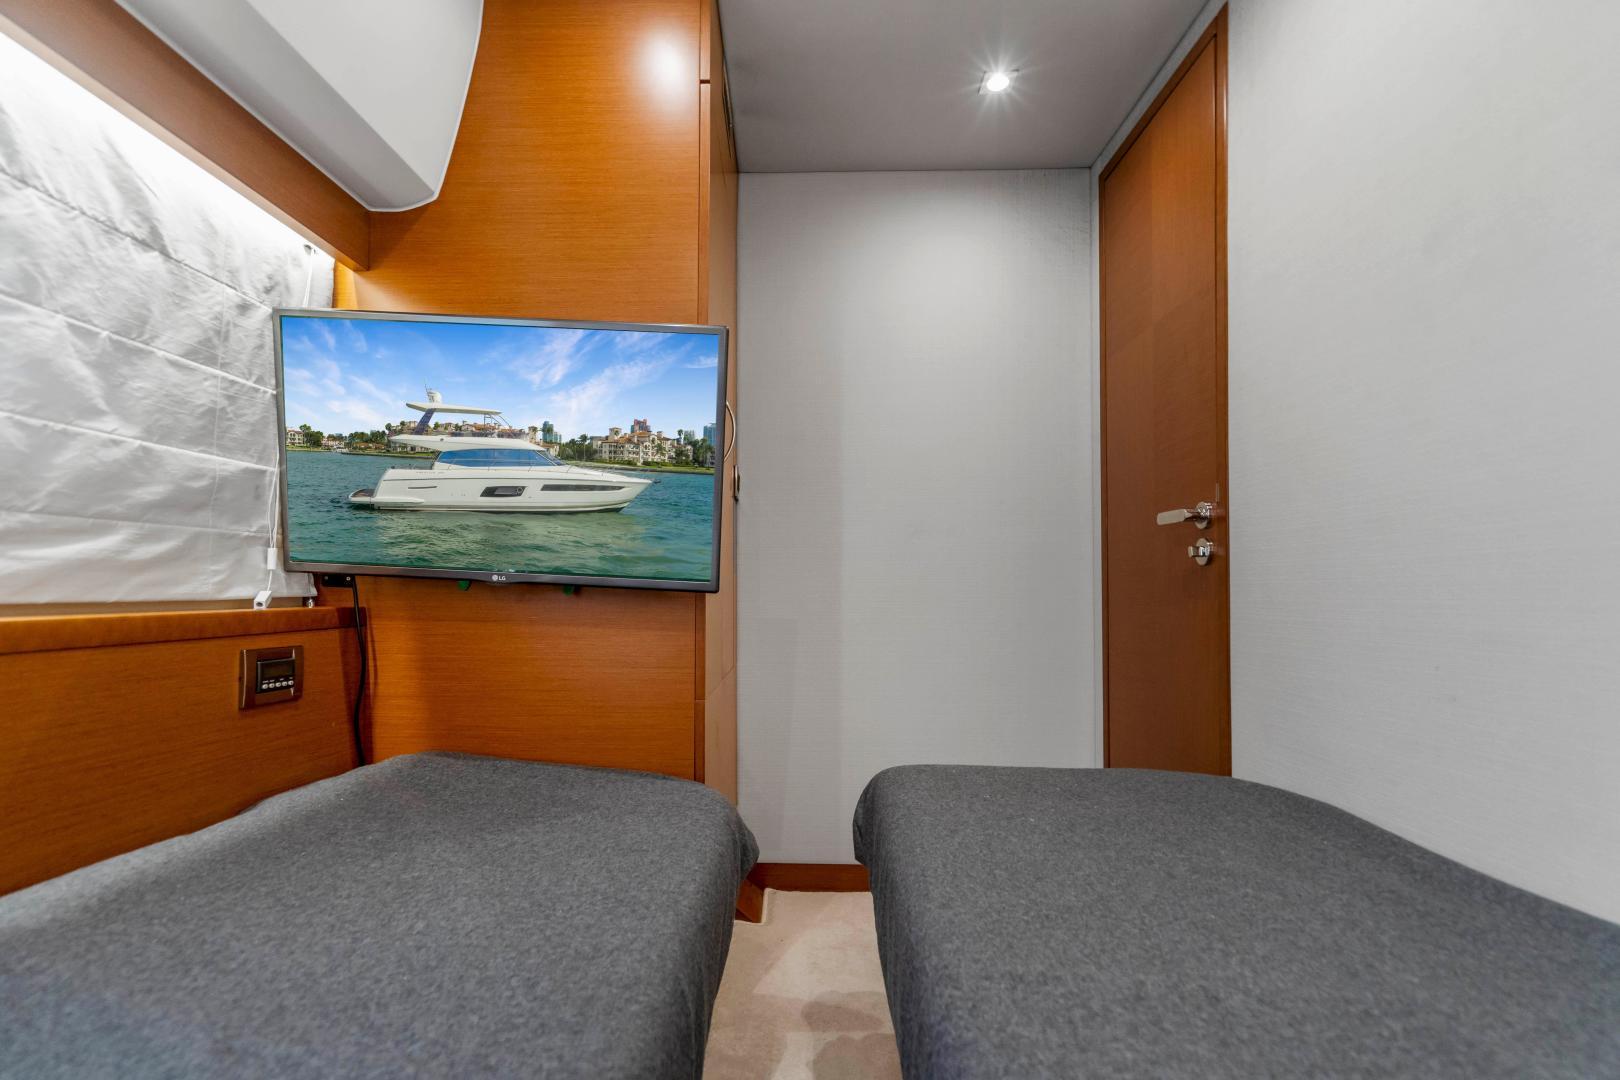 Prestige-Flybridge 2015-Aqua Miami-Florida-United States-1545963   Thumbnail